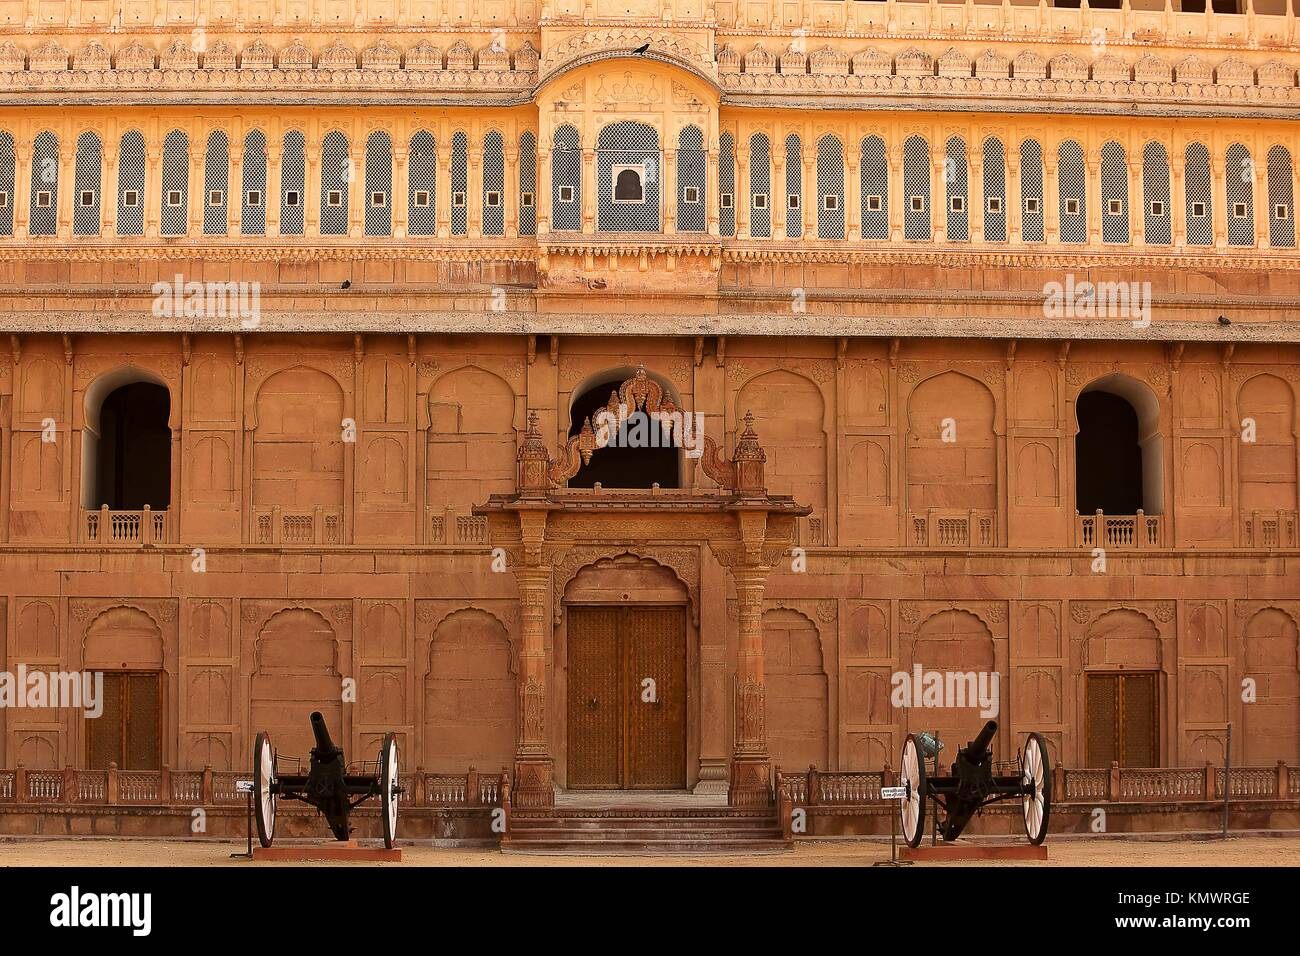 Junagarh Fort in city of Bikaner rajasthan state in india - Stock Image